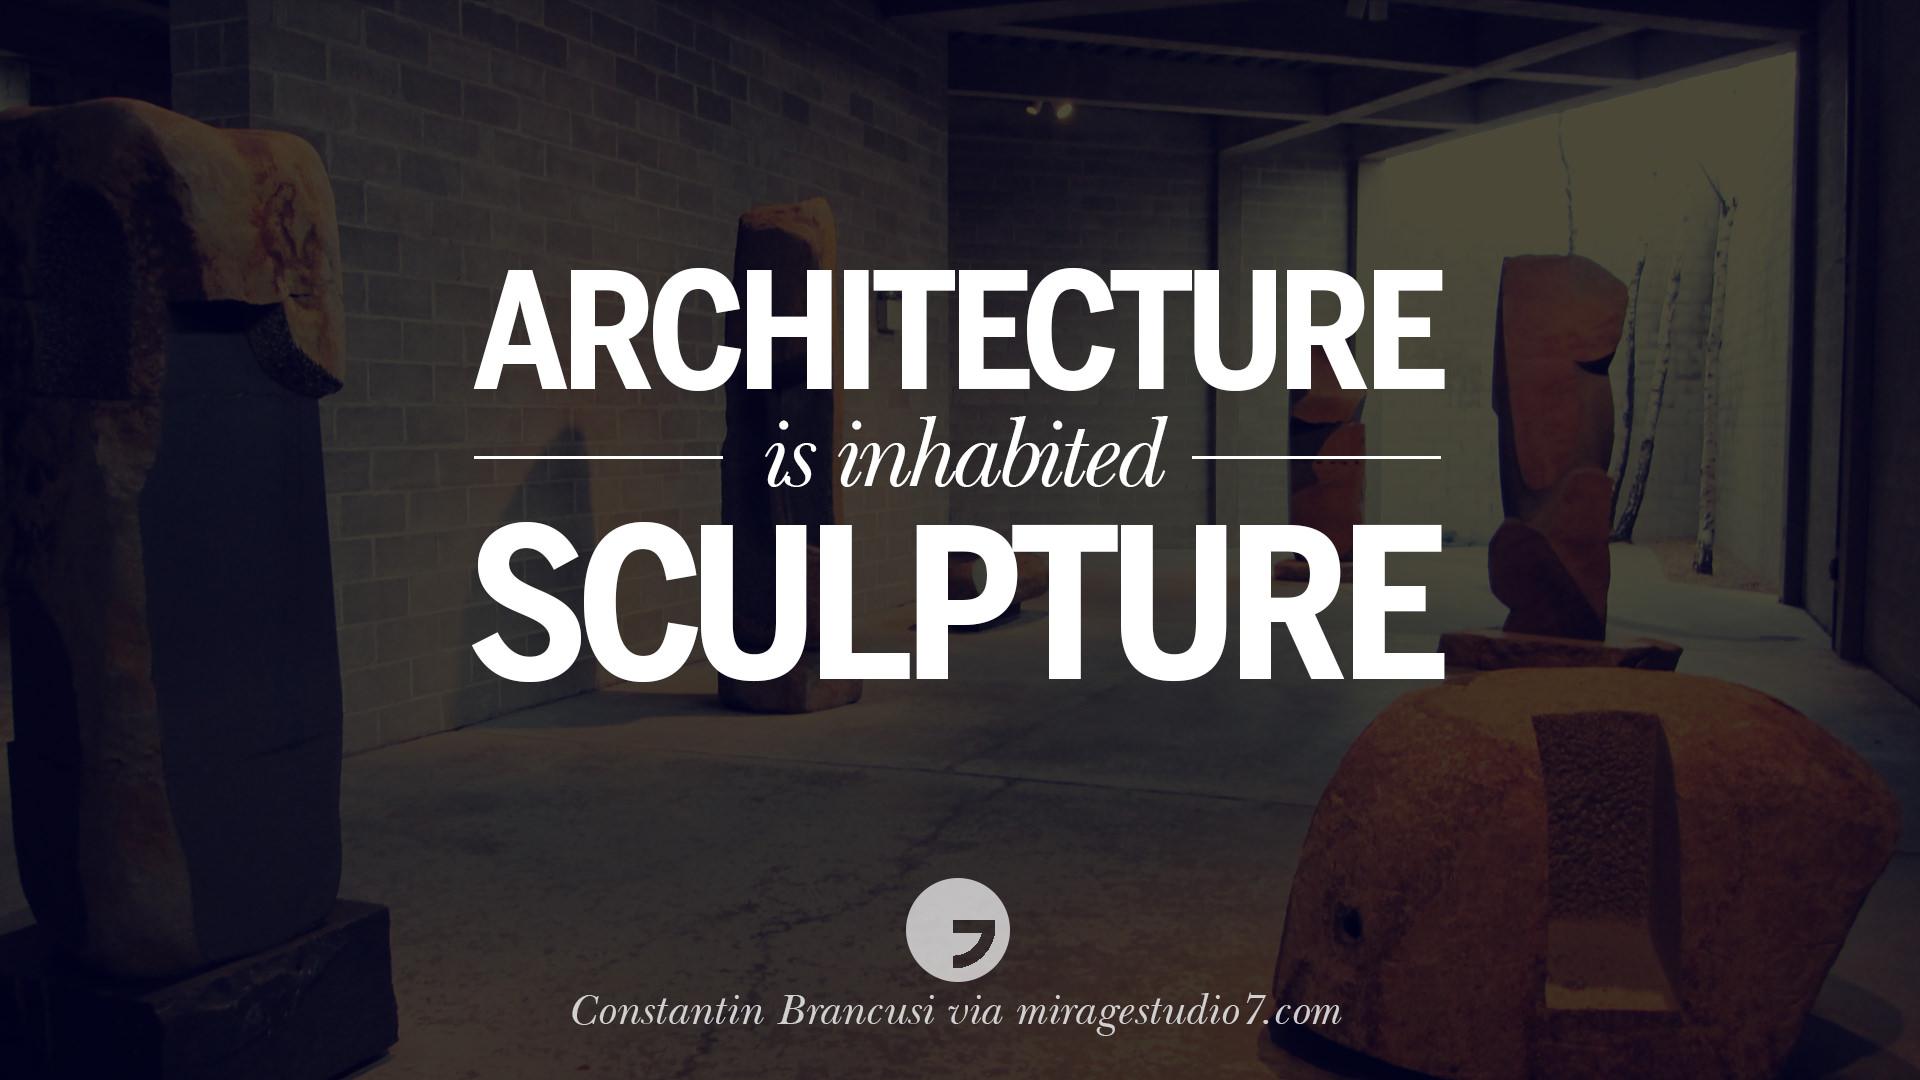 architecture quotes architects famous interior inspirational designers sculpture architect landscape constantin brancusi inhabited cost miragestudio7